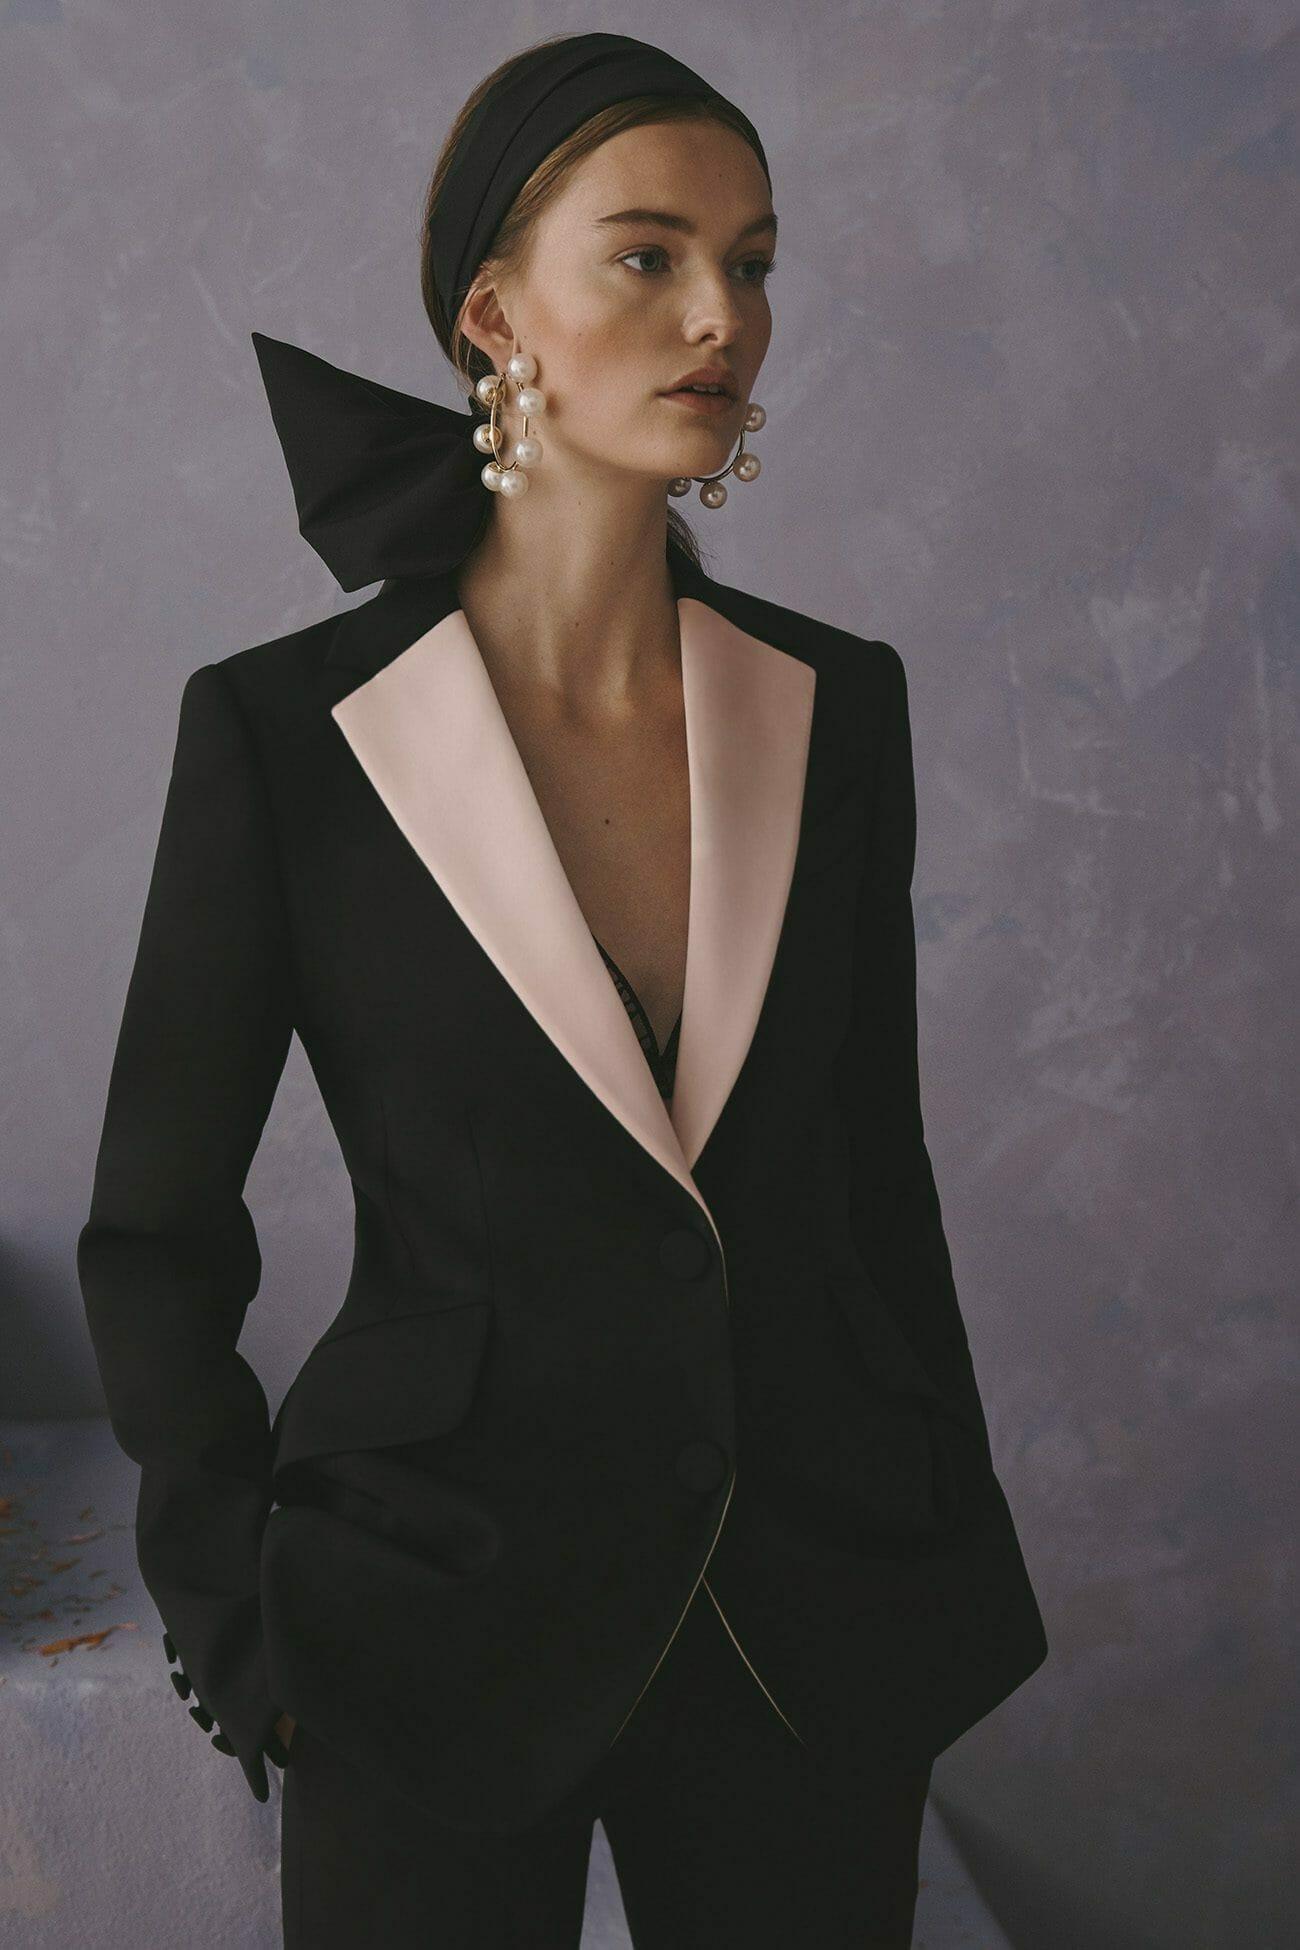 Carolina Herrera New York Resort 2020 Collection black white suit